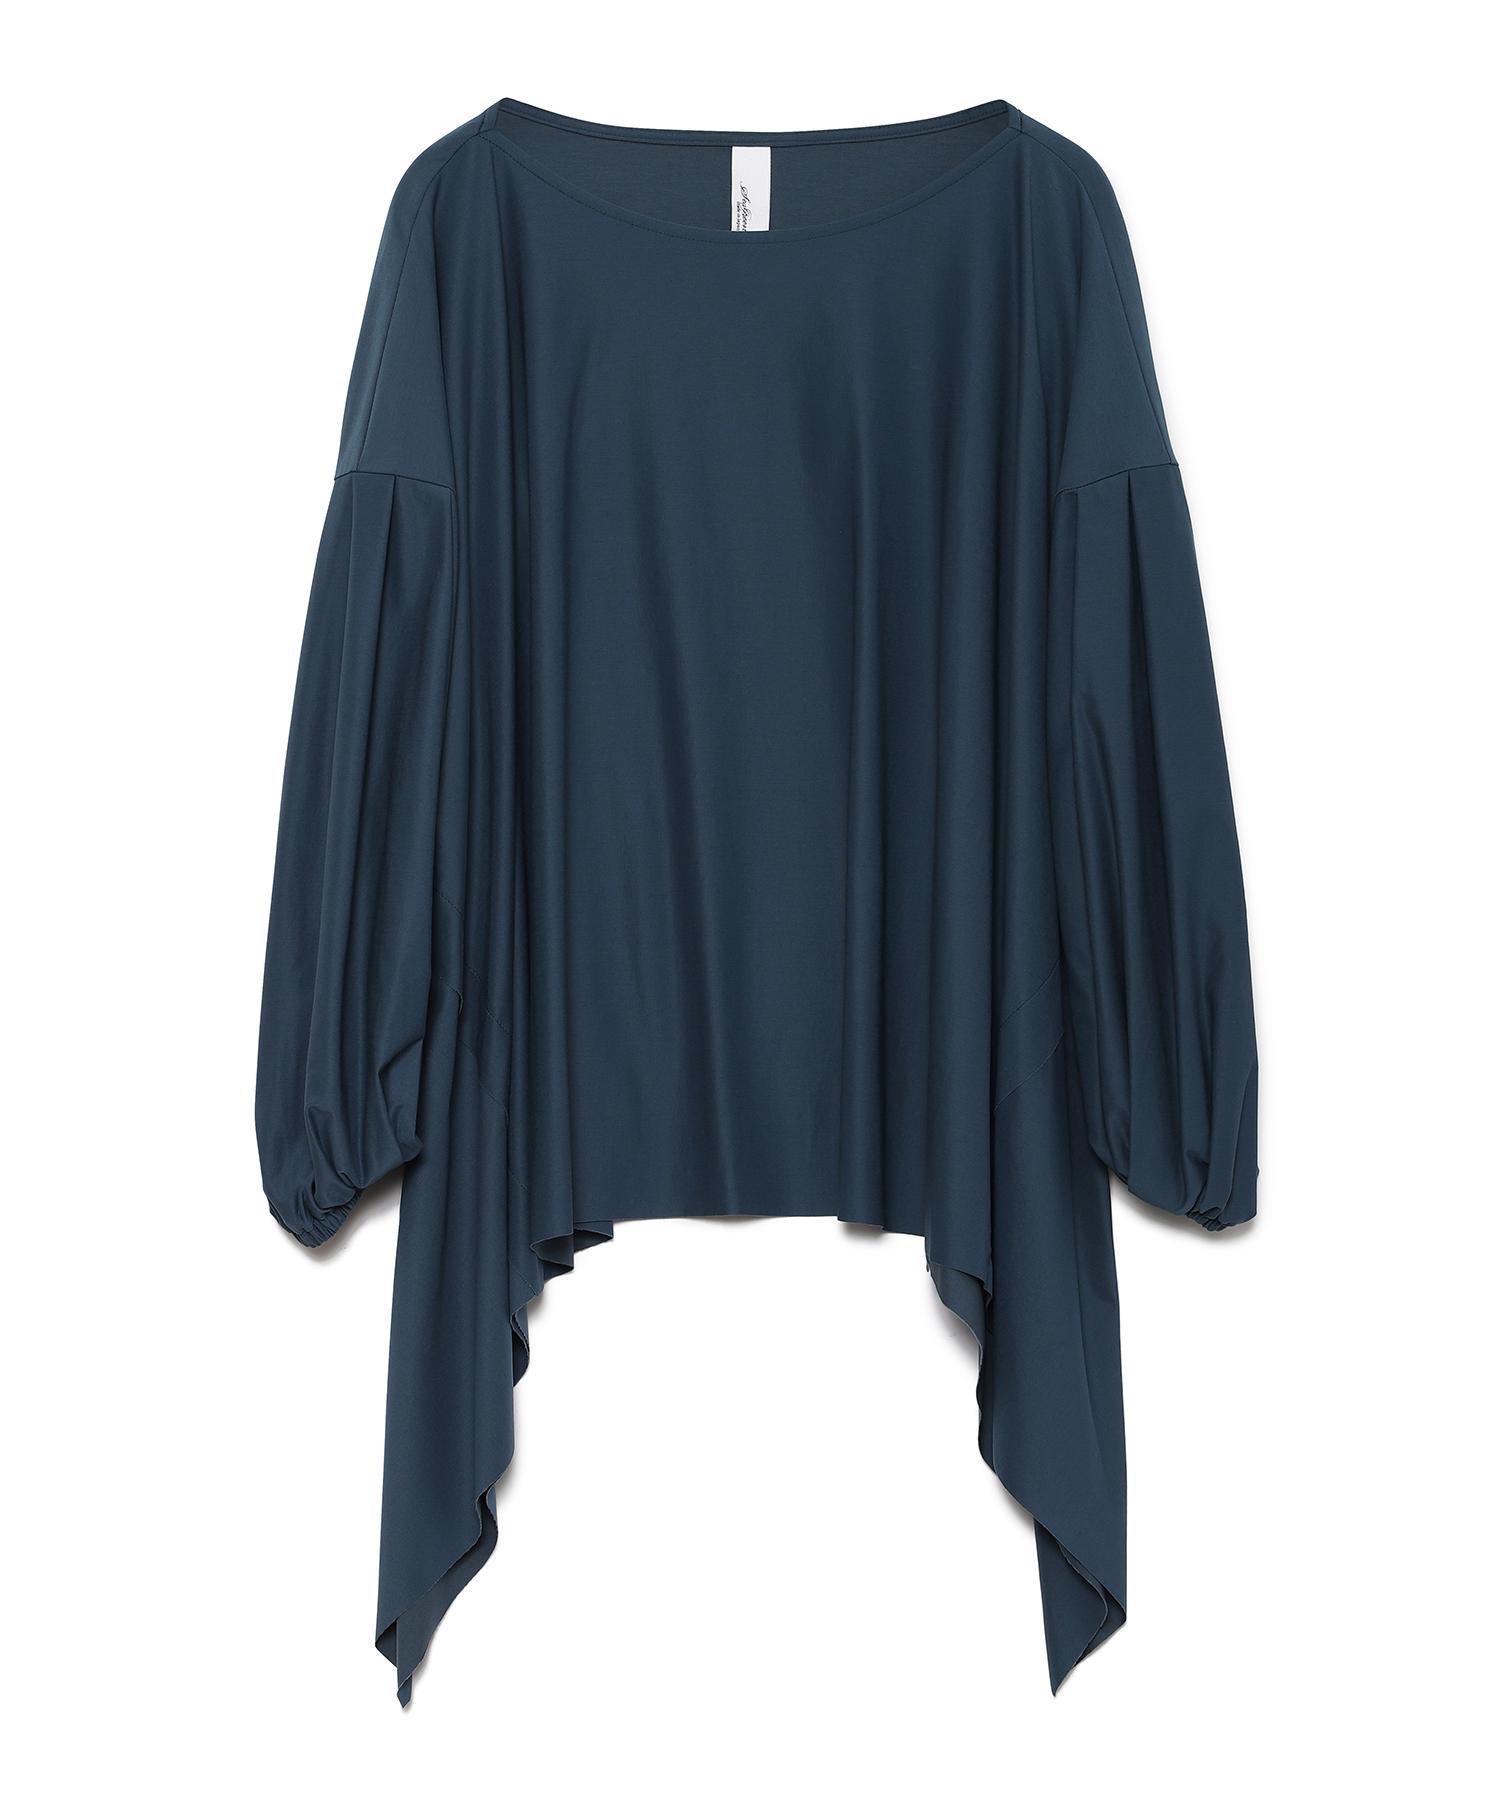 Seagreen CUT OFF CUT SEW blouse